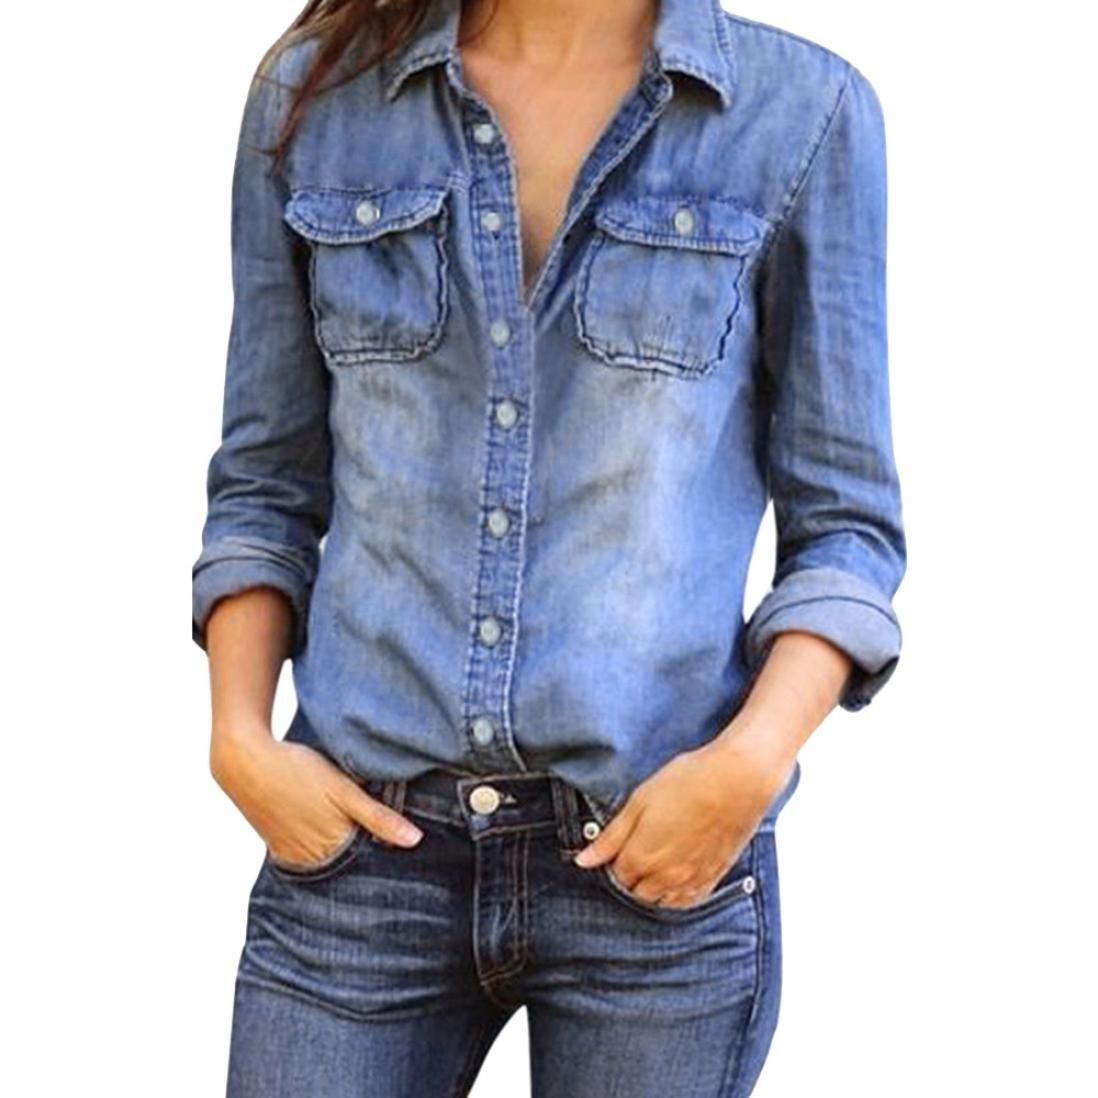 2018 New Women's Casual Blue Jean Jacket Denim Long Sleeve Shirt Tops Blouse by E-Scenery (Blue, Large)